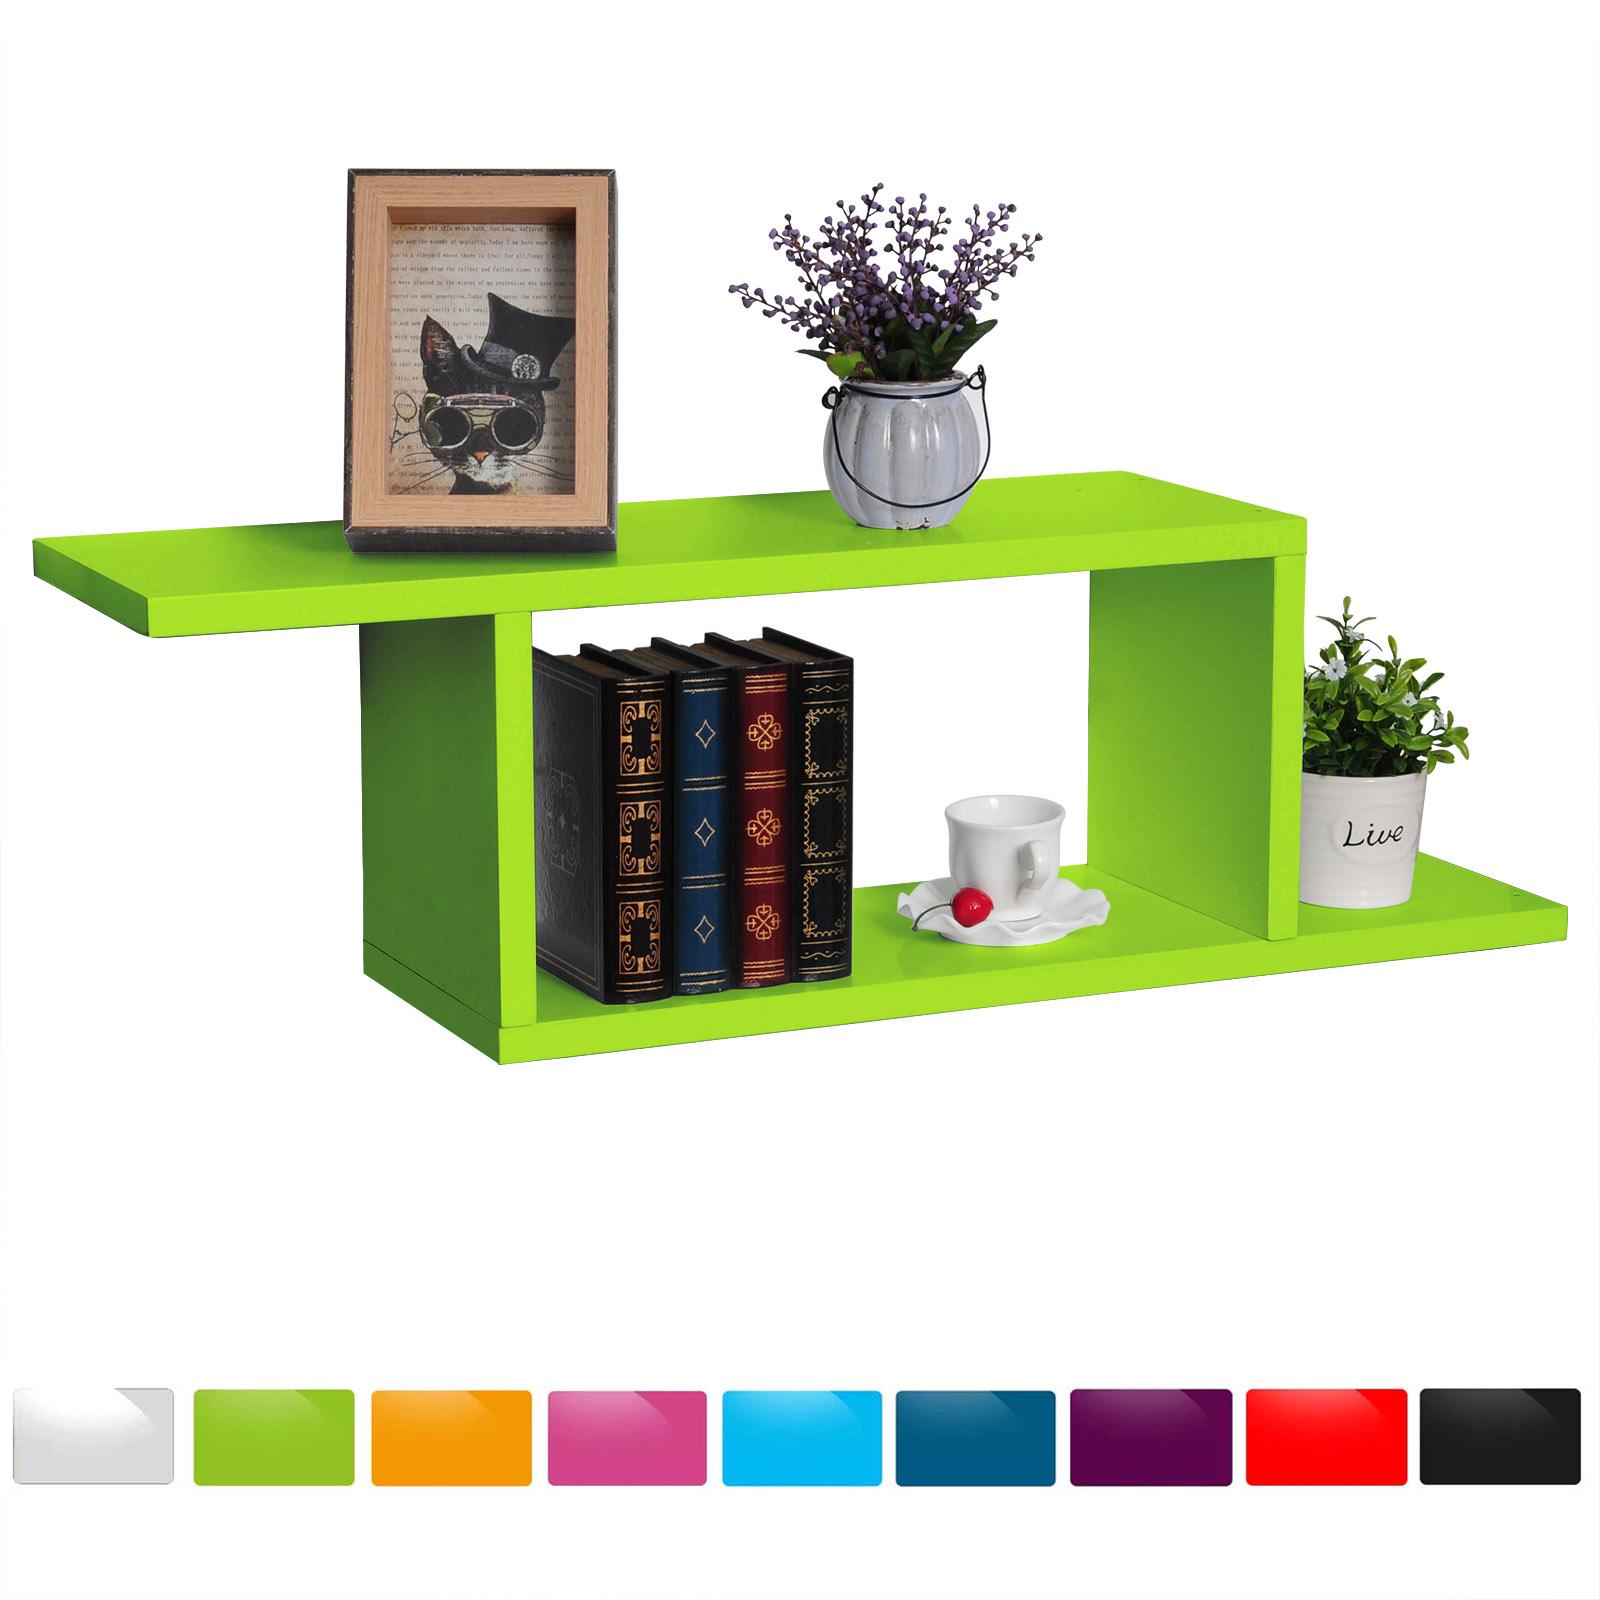 lot de 3 tag re murale en mdf pour livres cd dvd tag re de mini petit pot f122 ebay. Black Bedroom Furniture Sets. Home Design Ideas